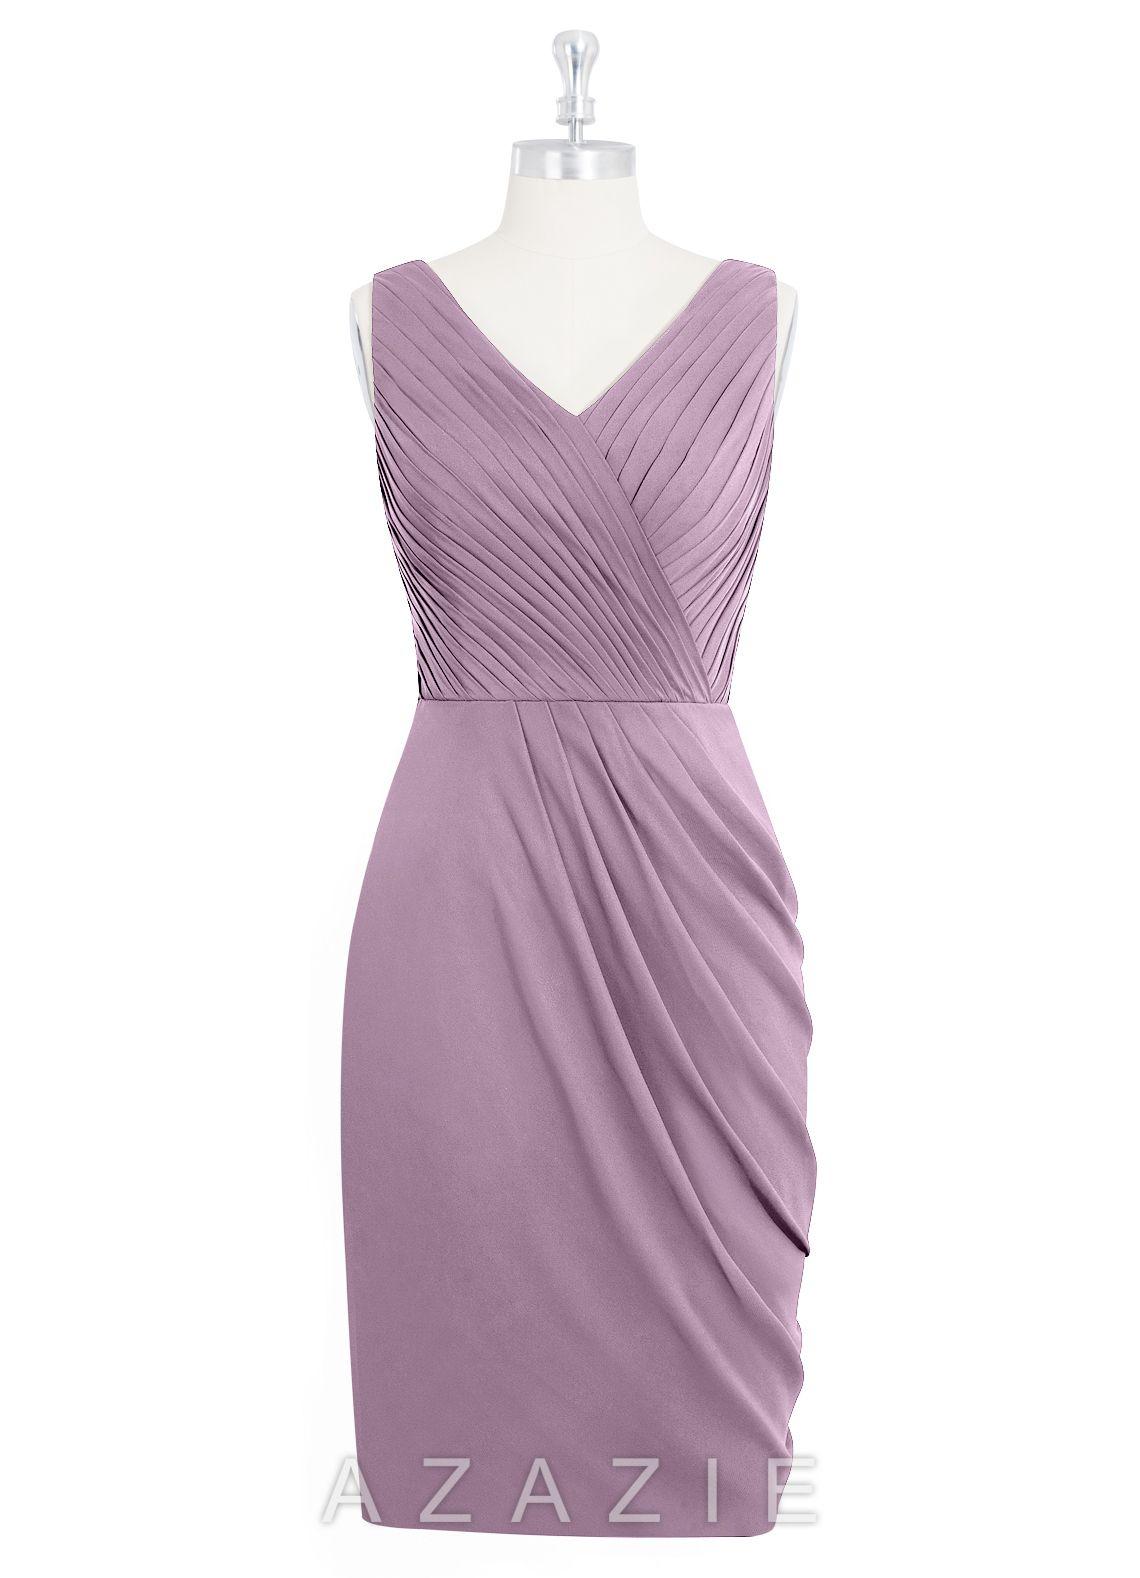 Cream colored vintage wedding dresses  Shop Azazie Bridesmaid Dress  Jordyn in Chiffon Find the perfect